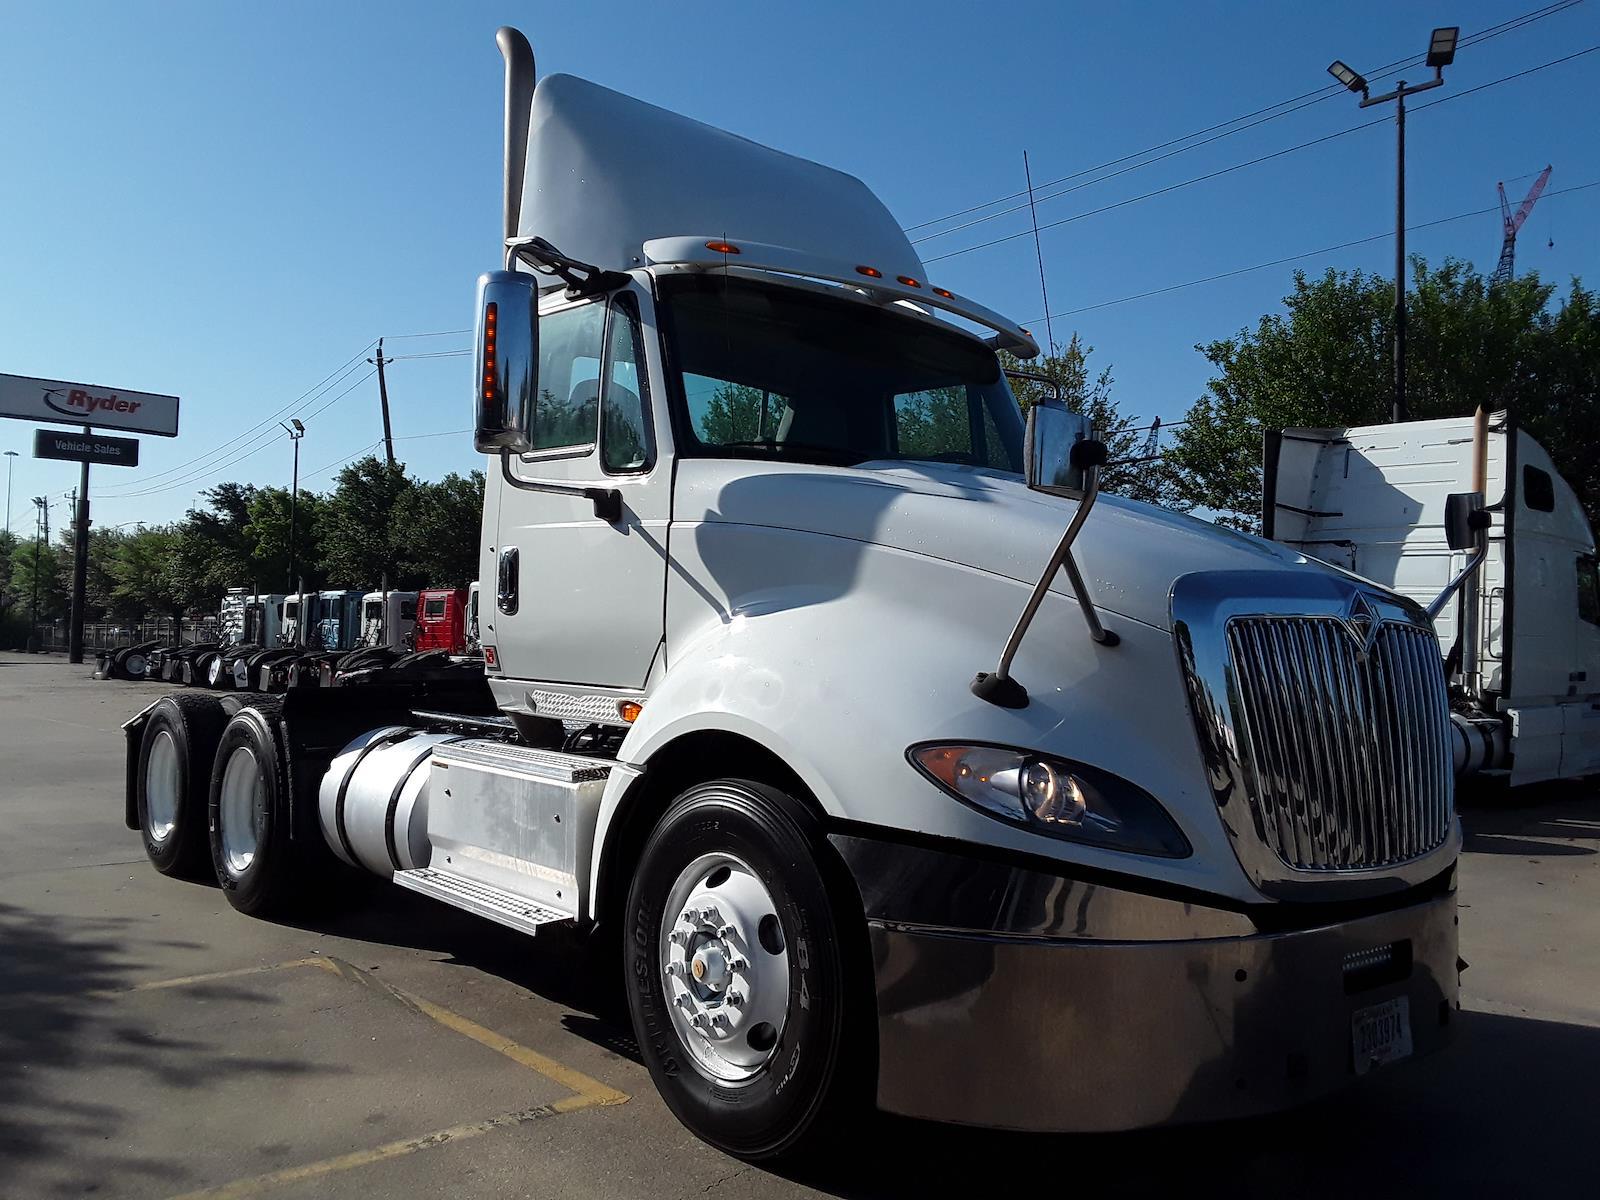 2015 International ProStar+ 6x4, Tractor #637881 - photo 1